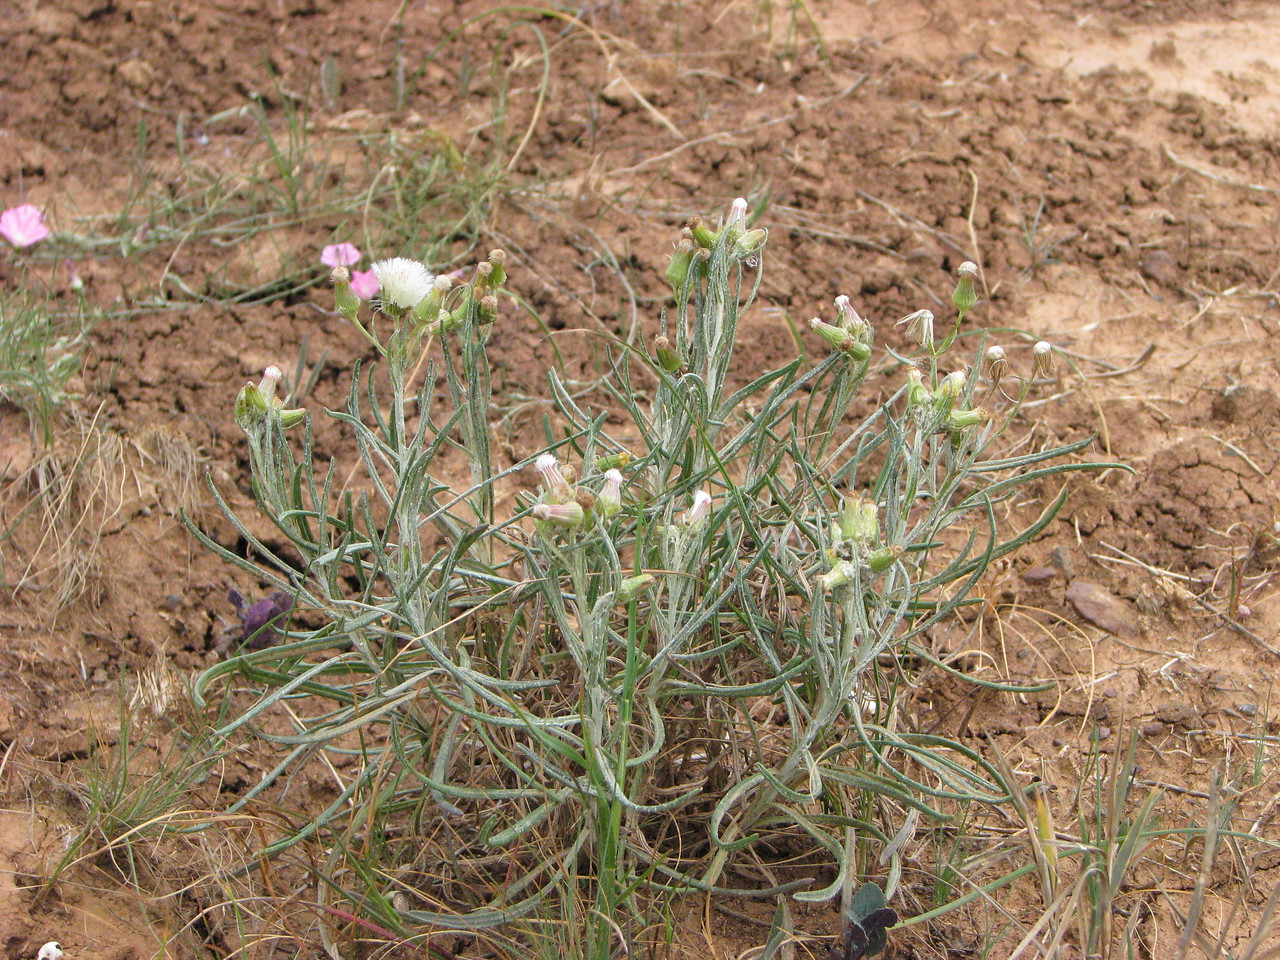 Senecio macrocarpus